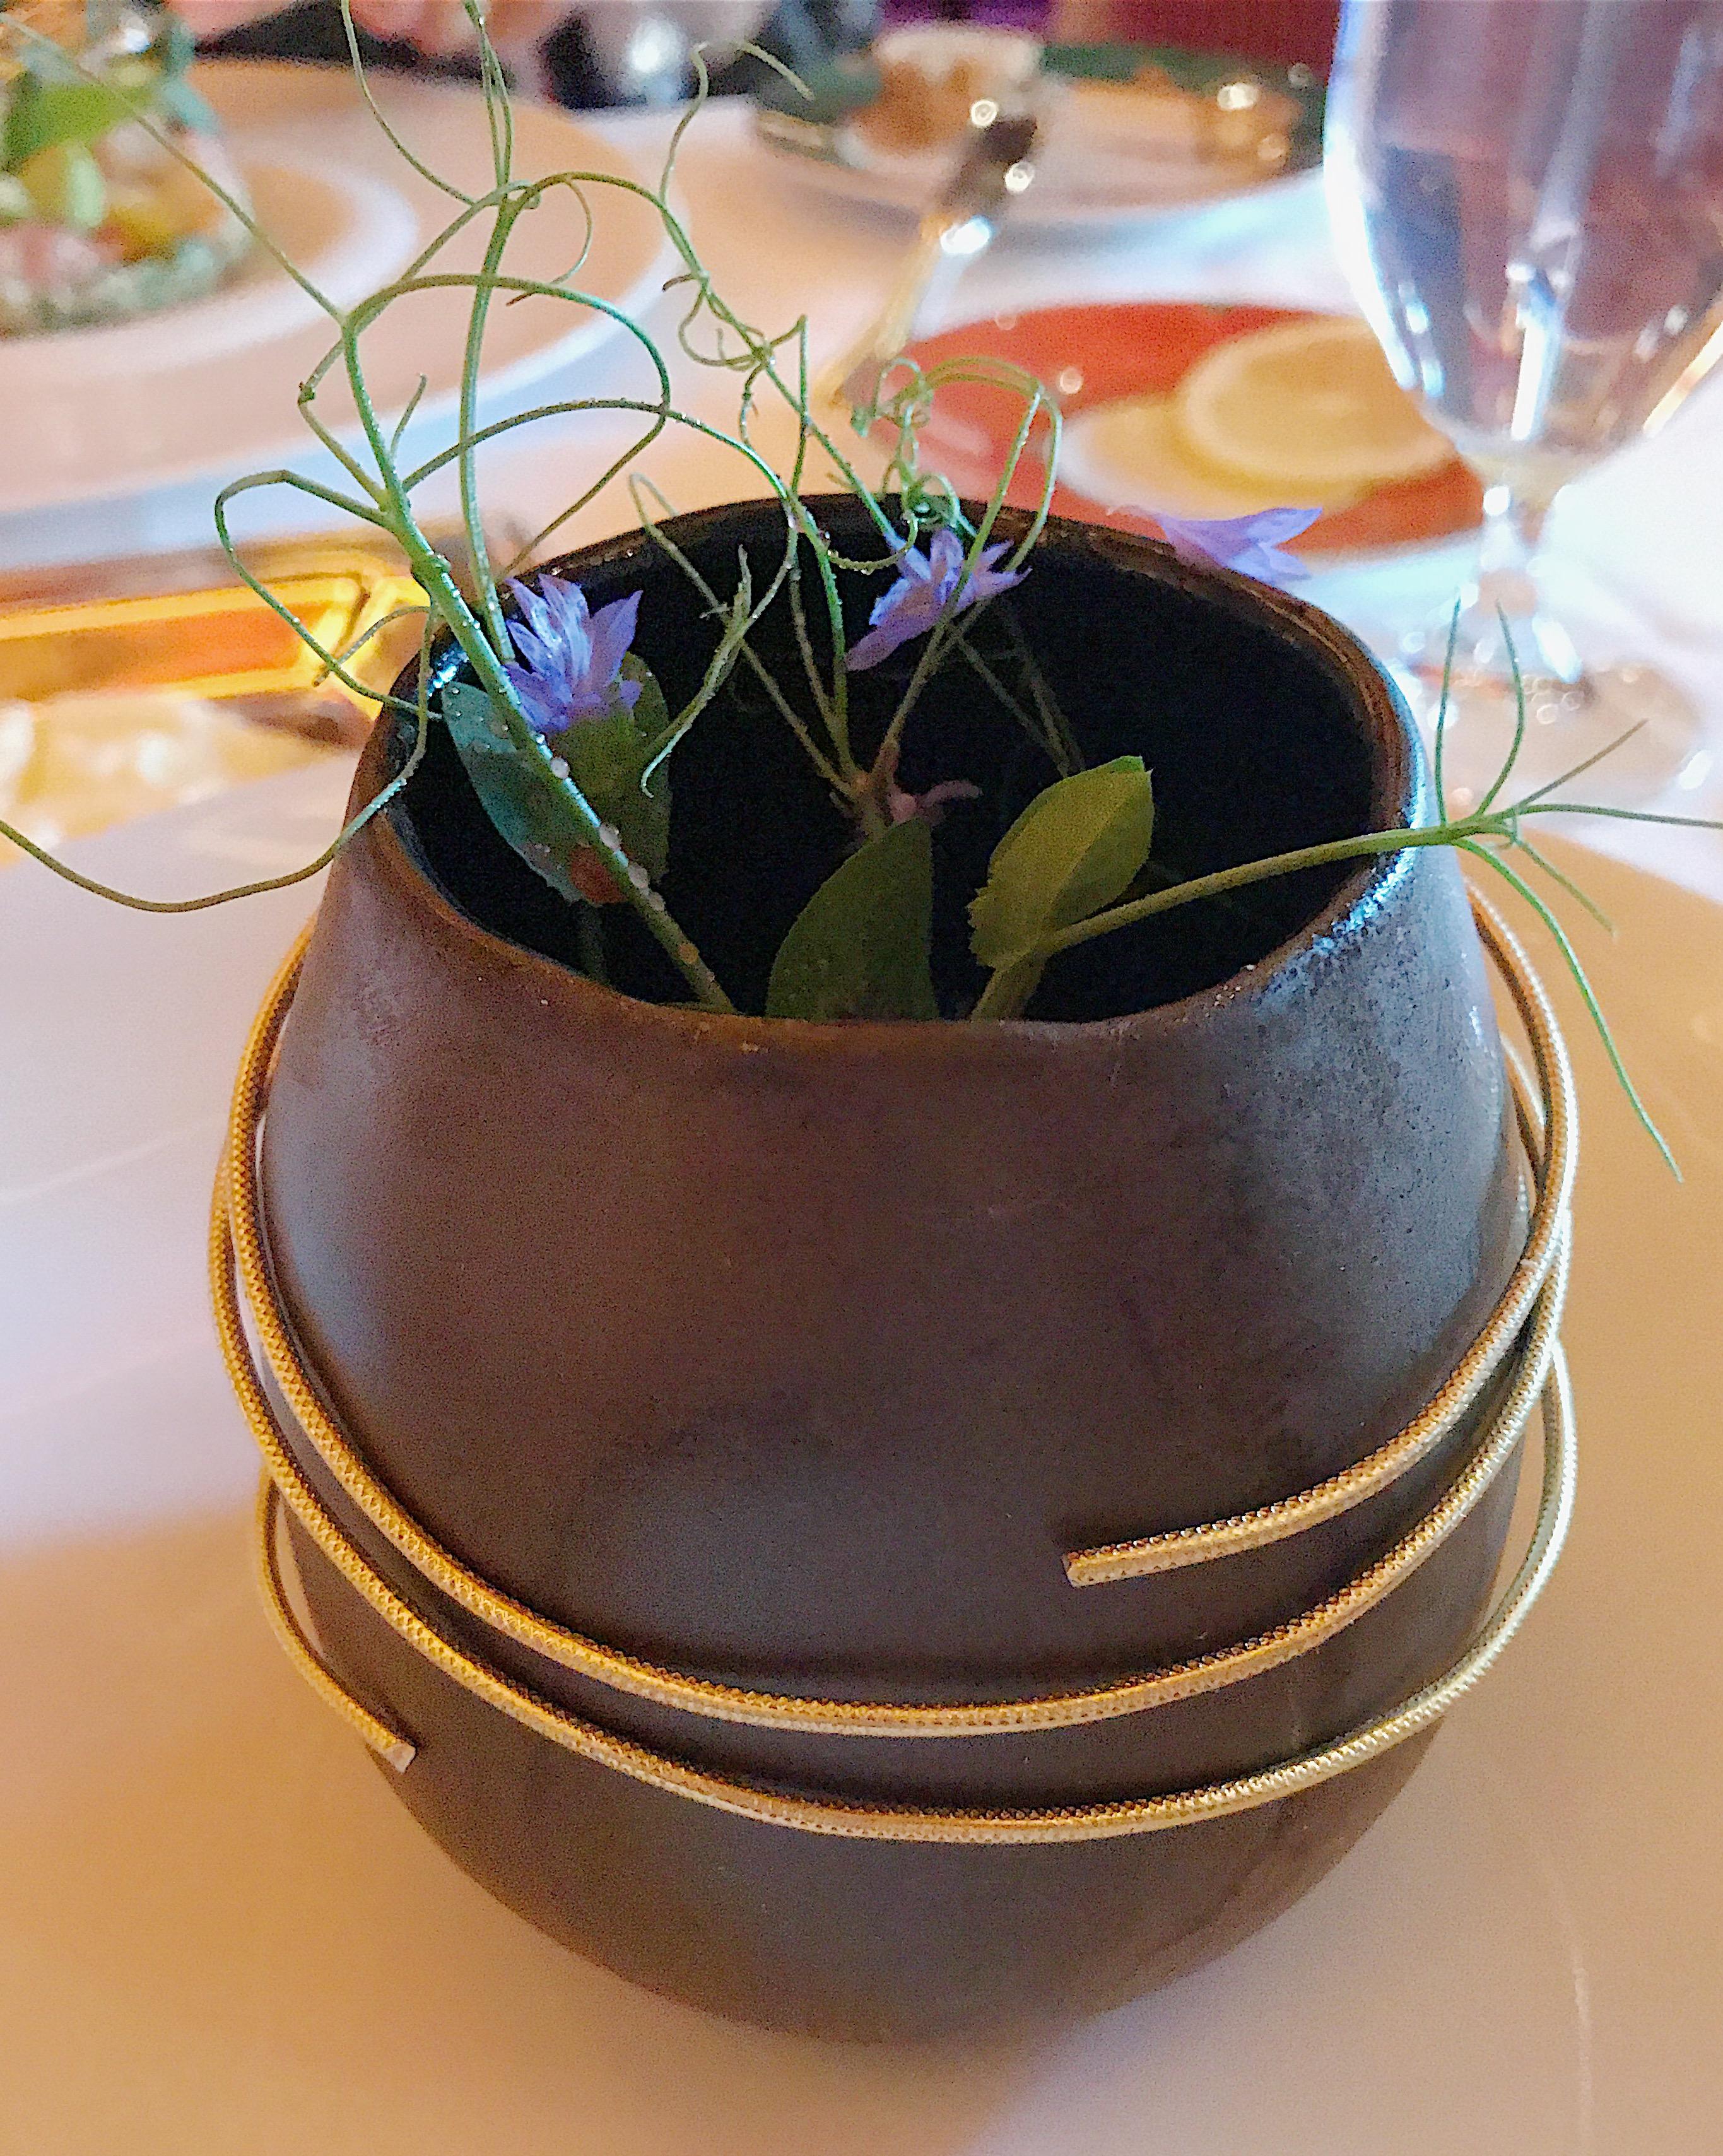 Hidden Spring Garden - kktravelsandeats